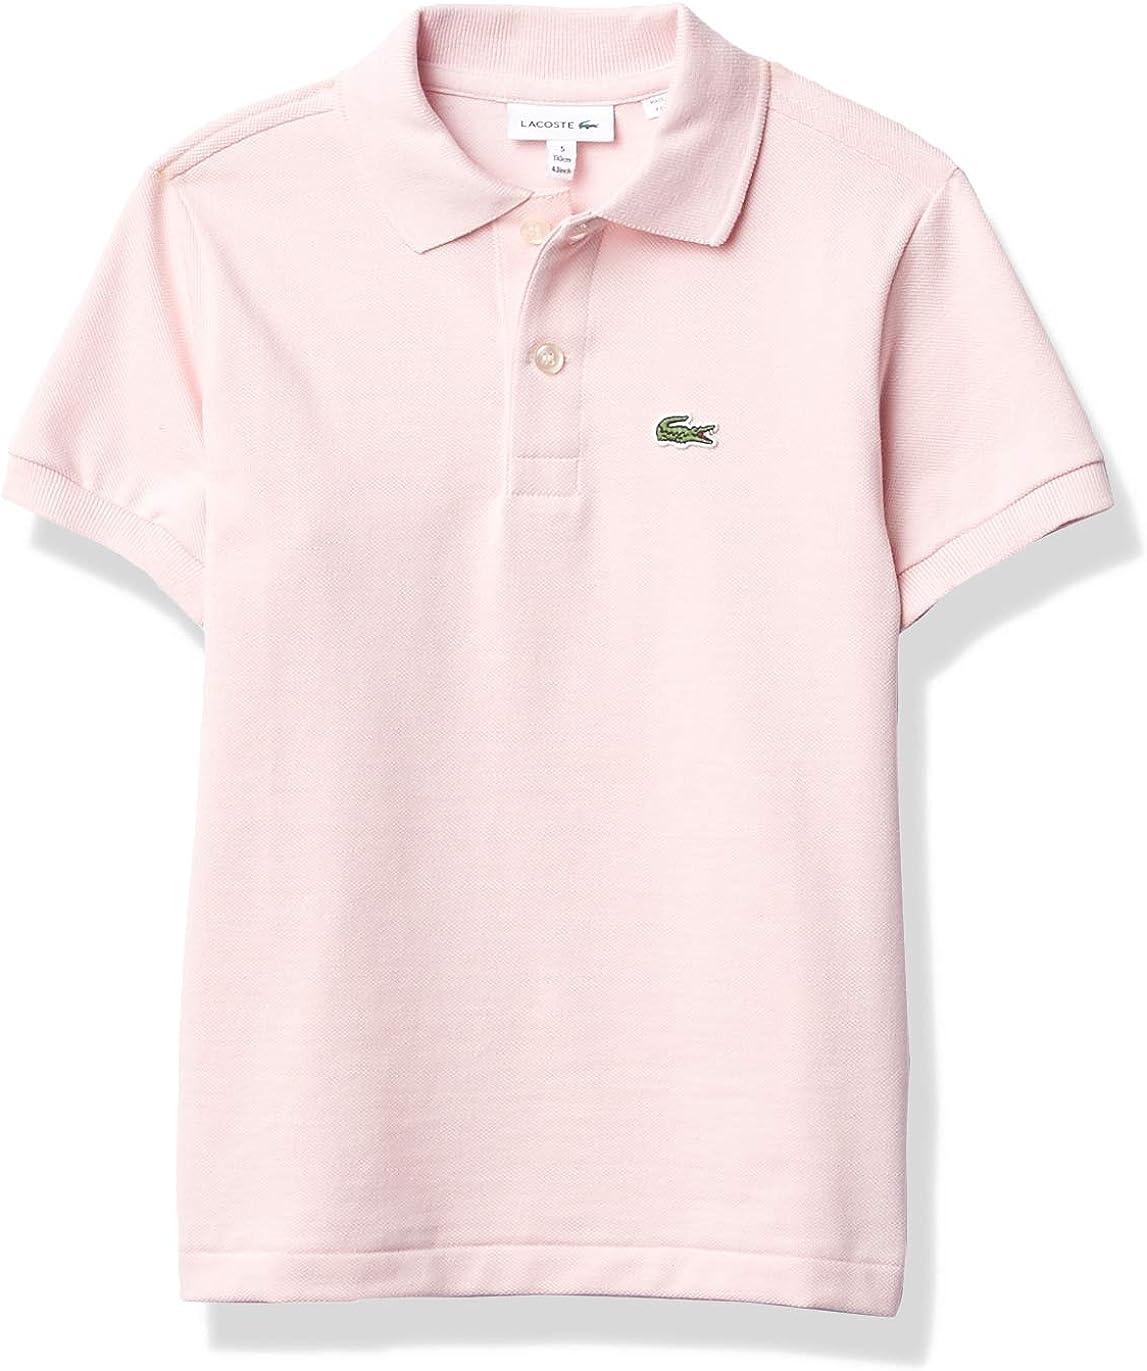 Lacoste Boys Short Sleeve Polo Bargain Pique Classic Direct store Shirt